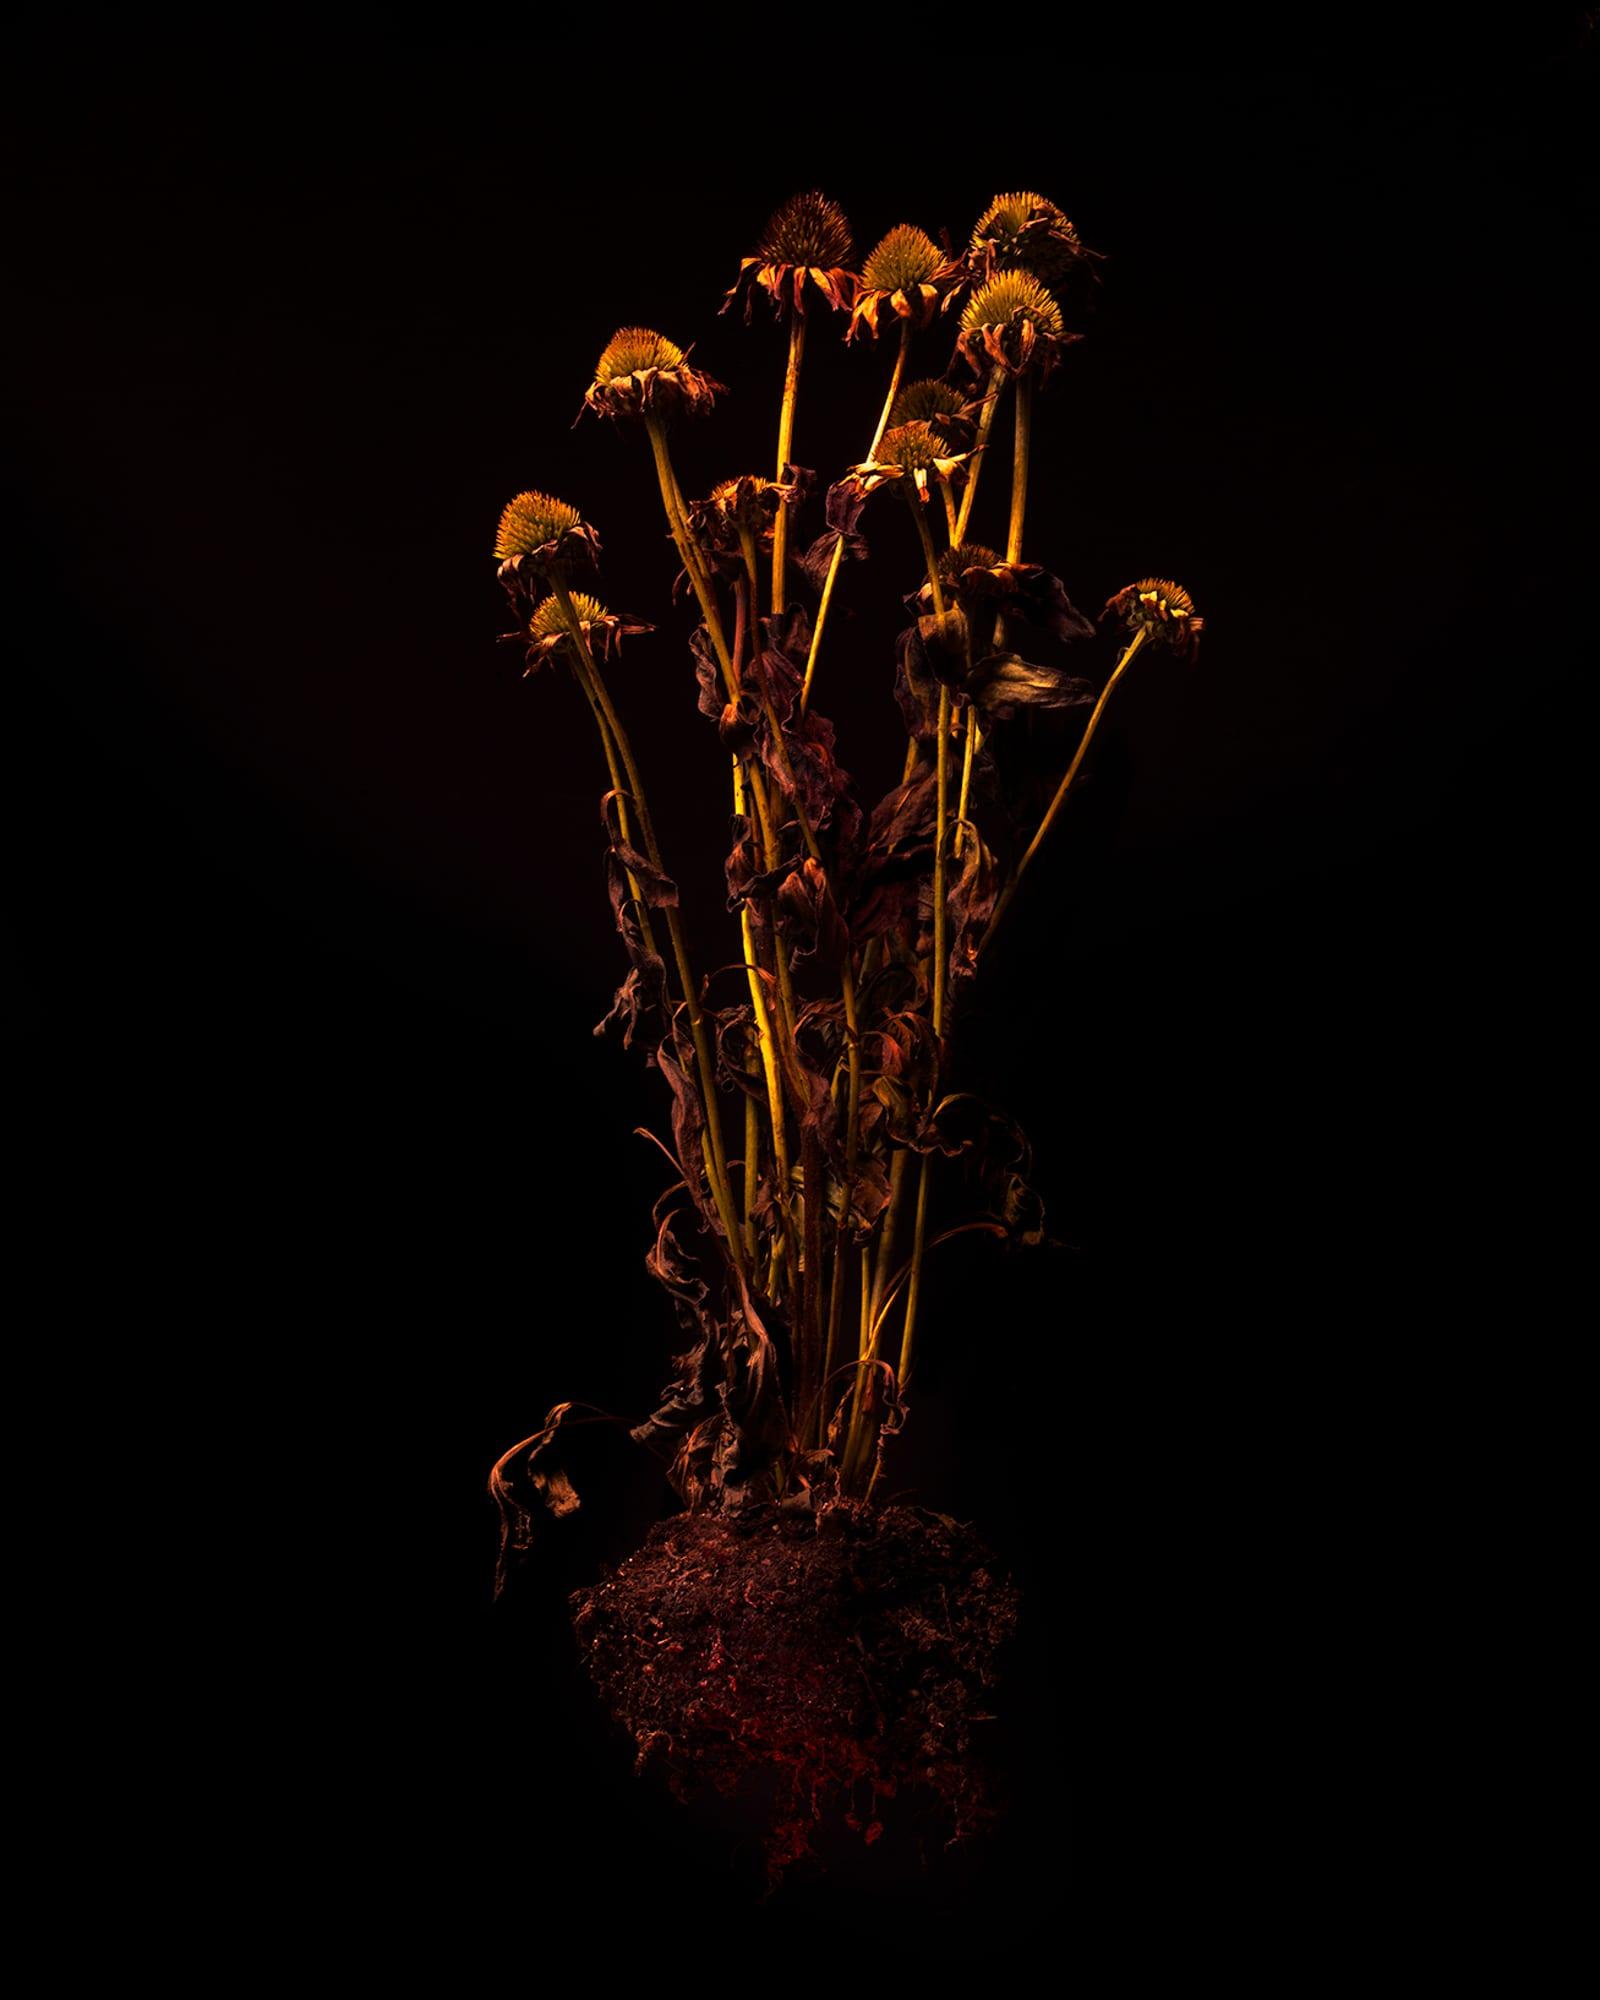 flowers_sized-1